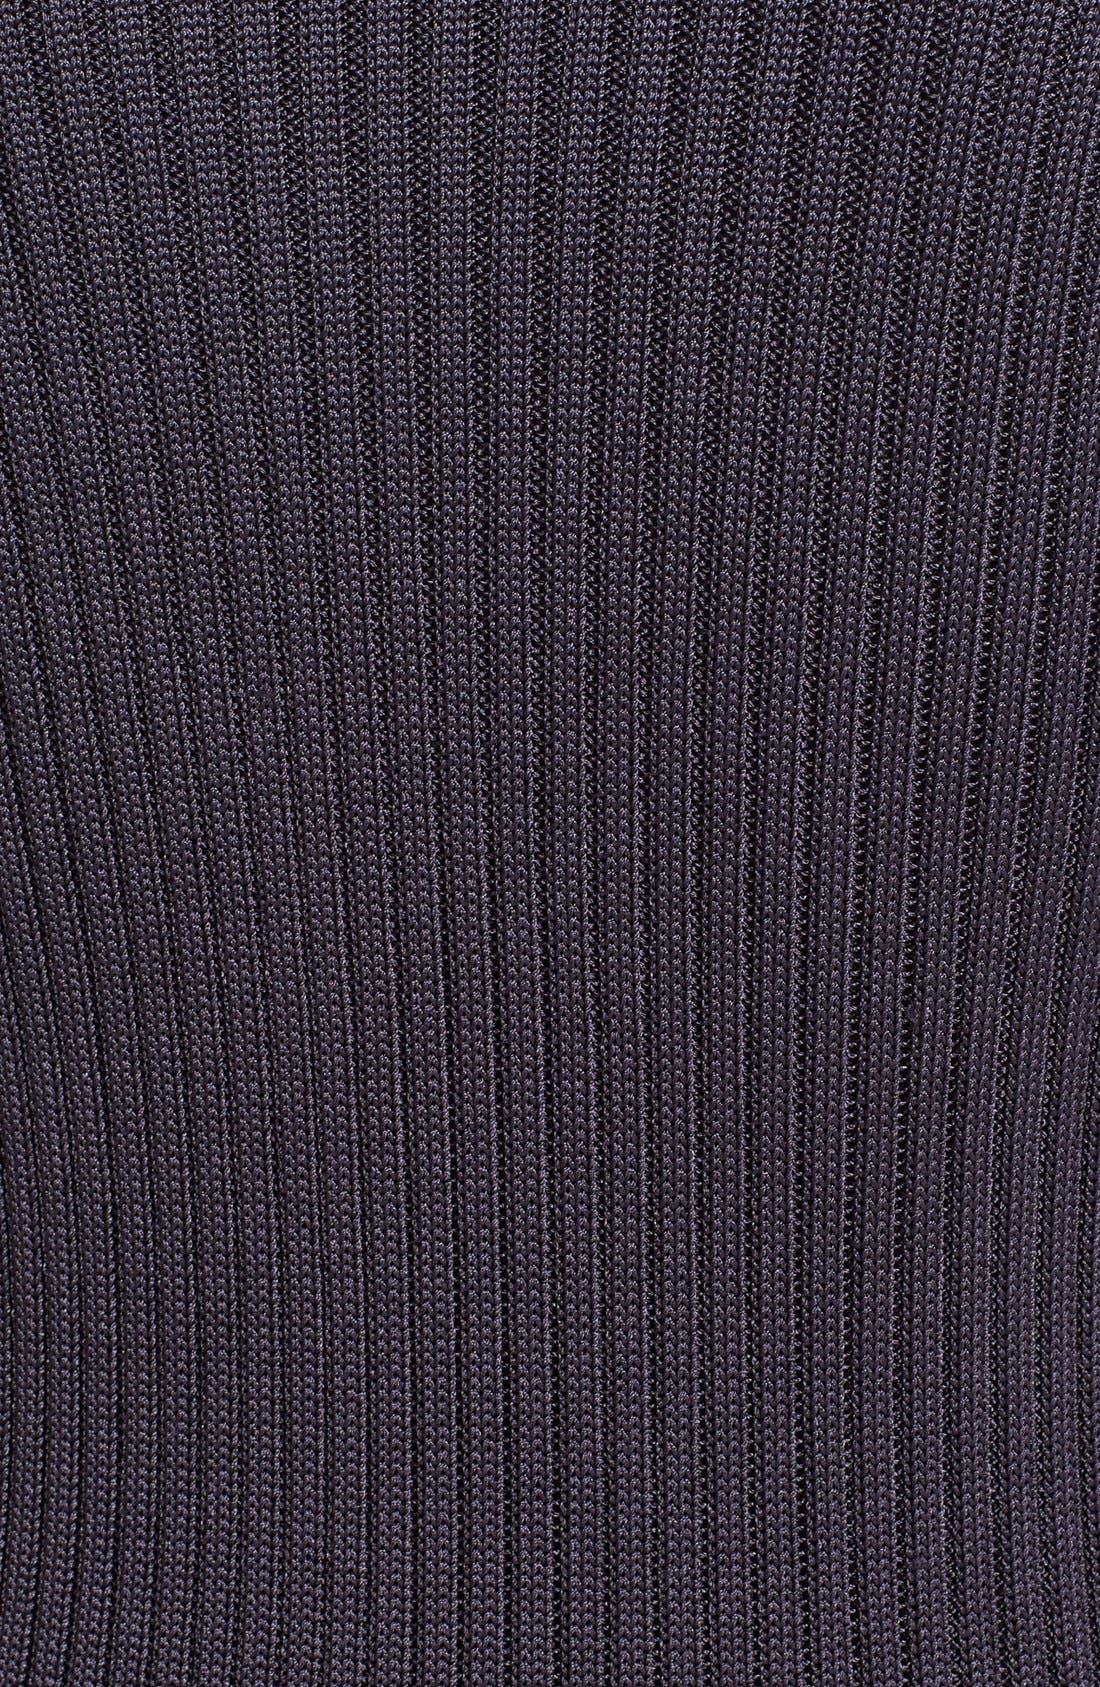 'Kristin' Long Colorblock Cardigan,                             Alternate thumbnail 3, color,                             020